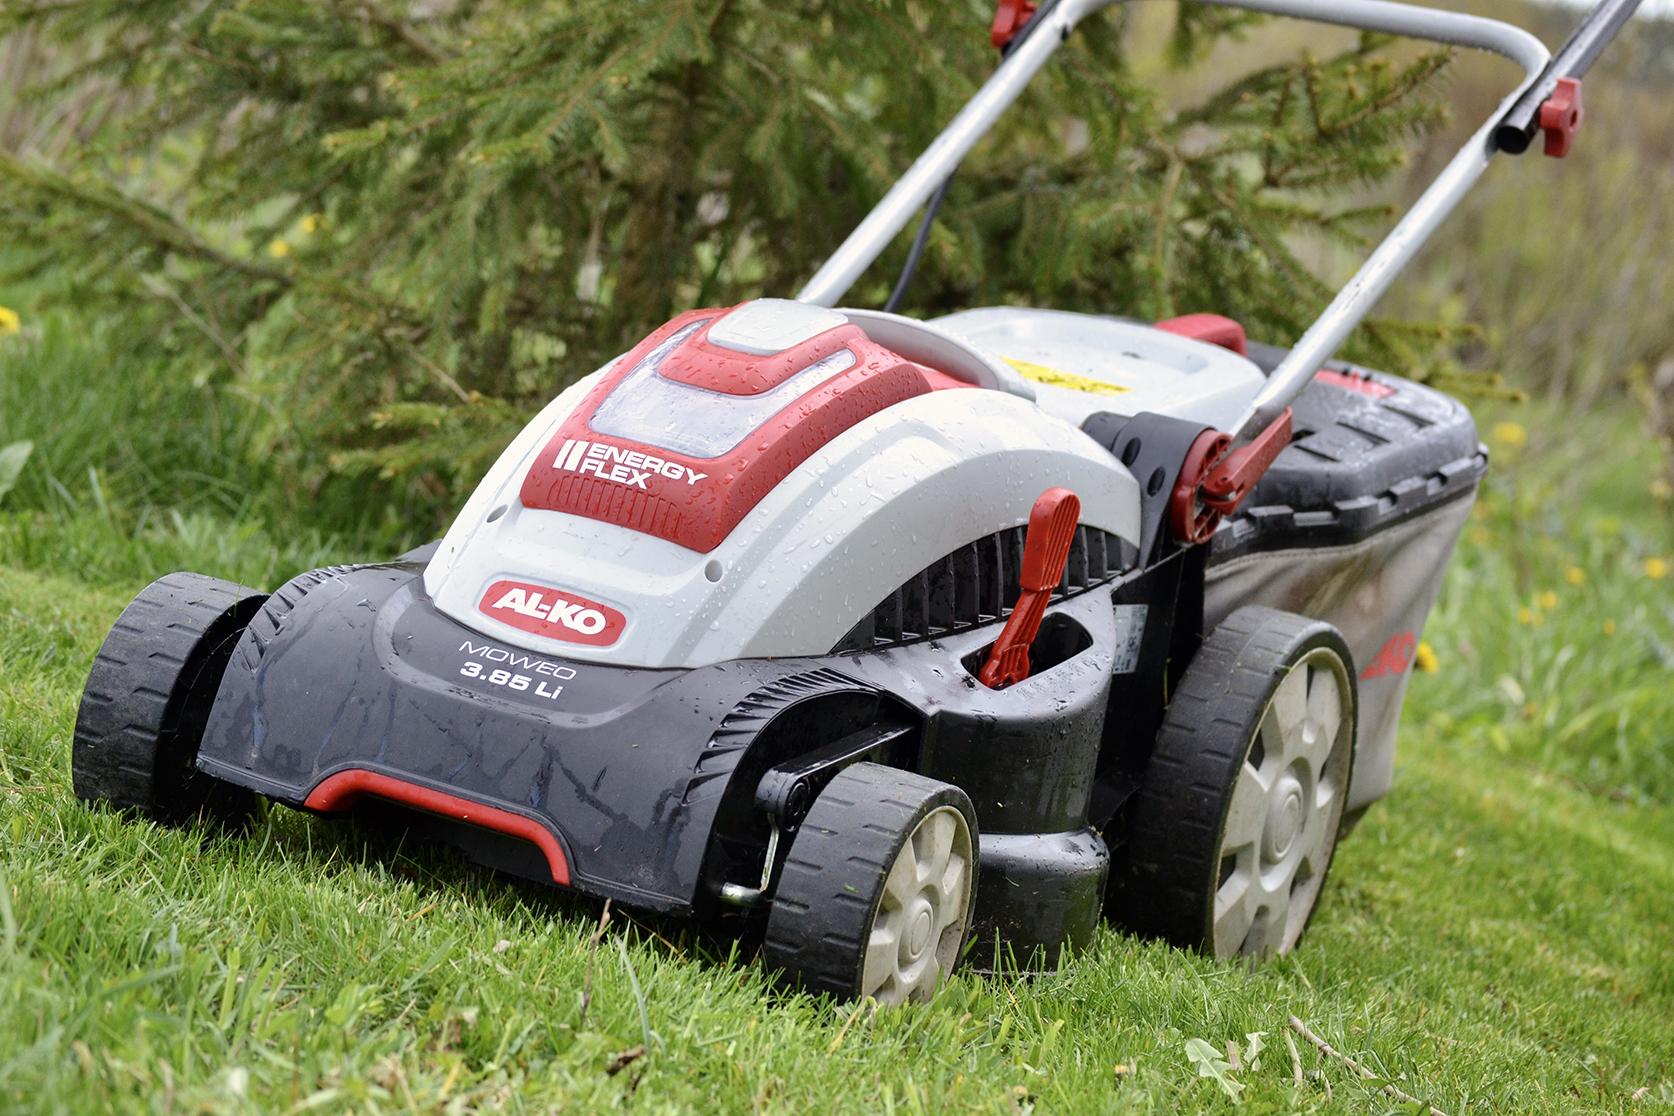 AL-KO EnergyFlex 3.85 Li redo att klippa gräset